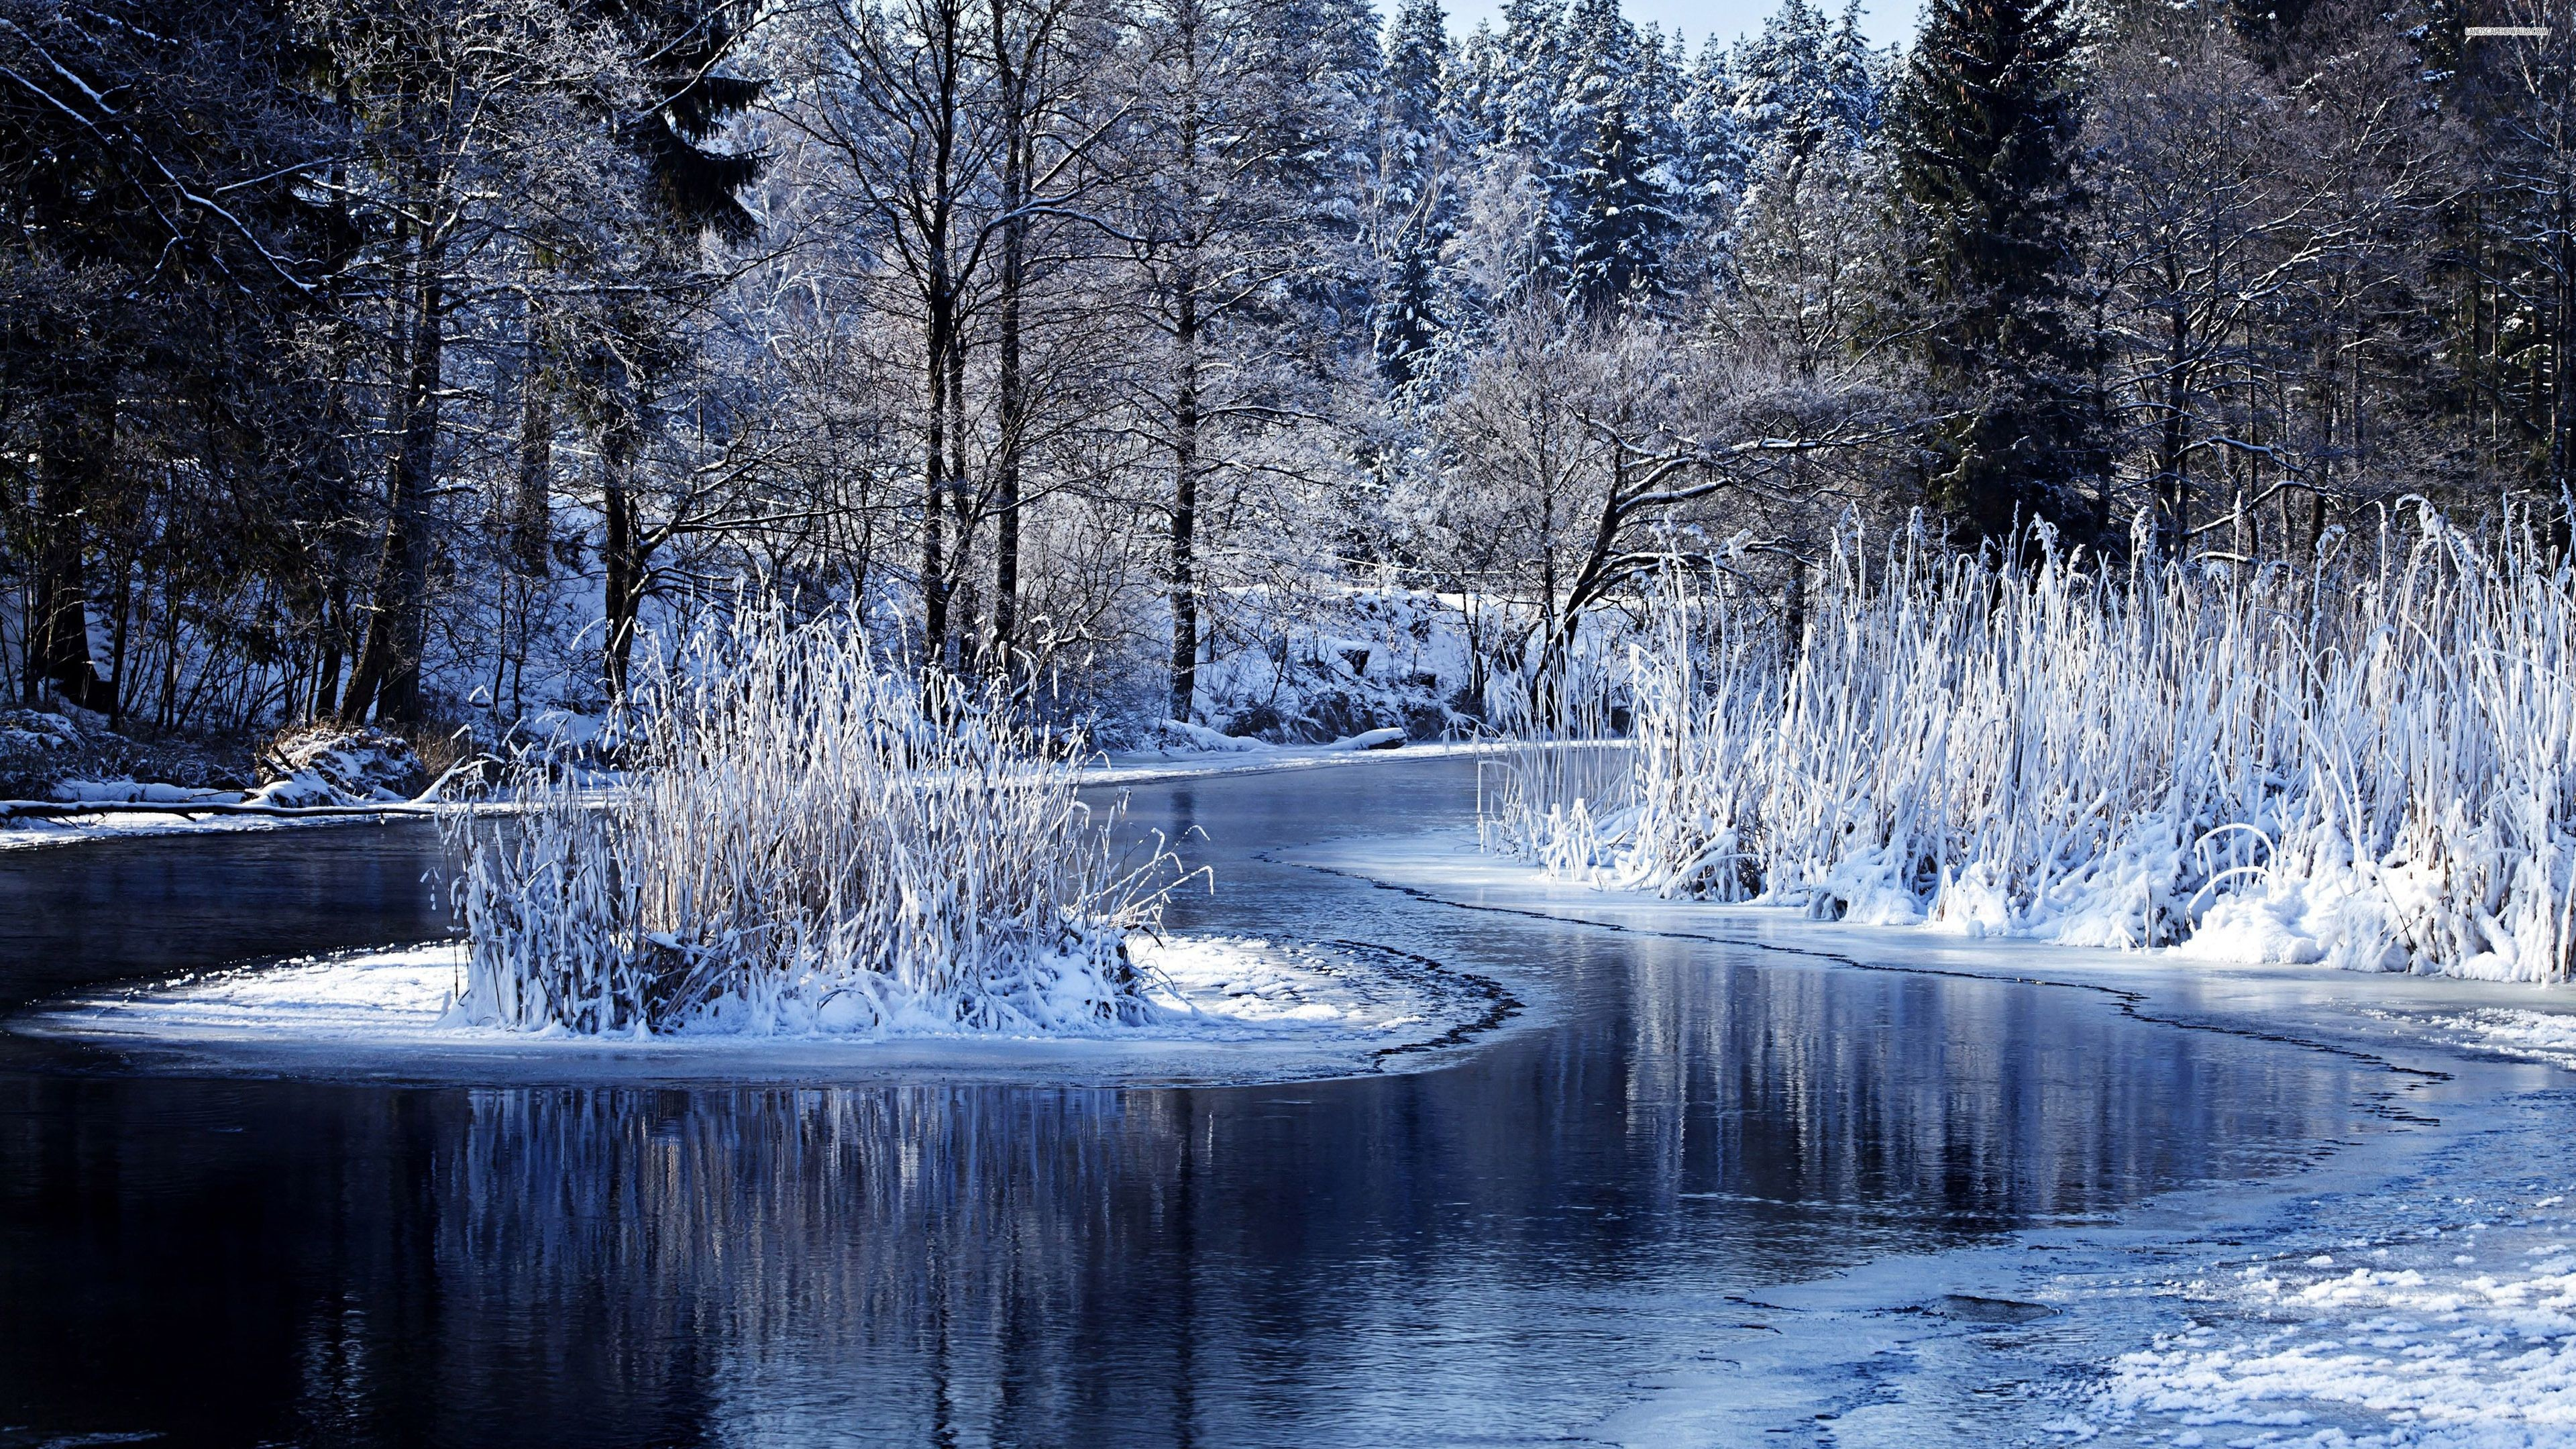 3840x2160 Winter On The Lake 4k Ultra Hd Wallpaper 4k Ultra Hd Winter 3840x2160 Wallpaper Teahub Io